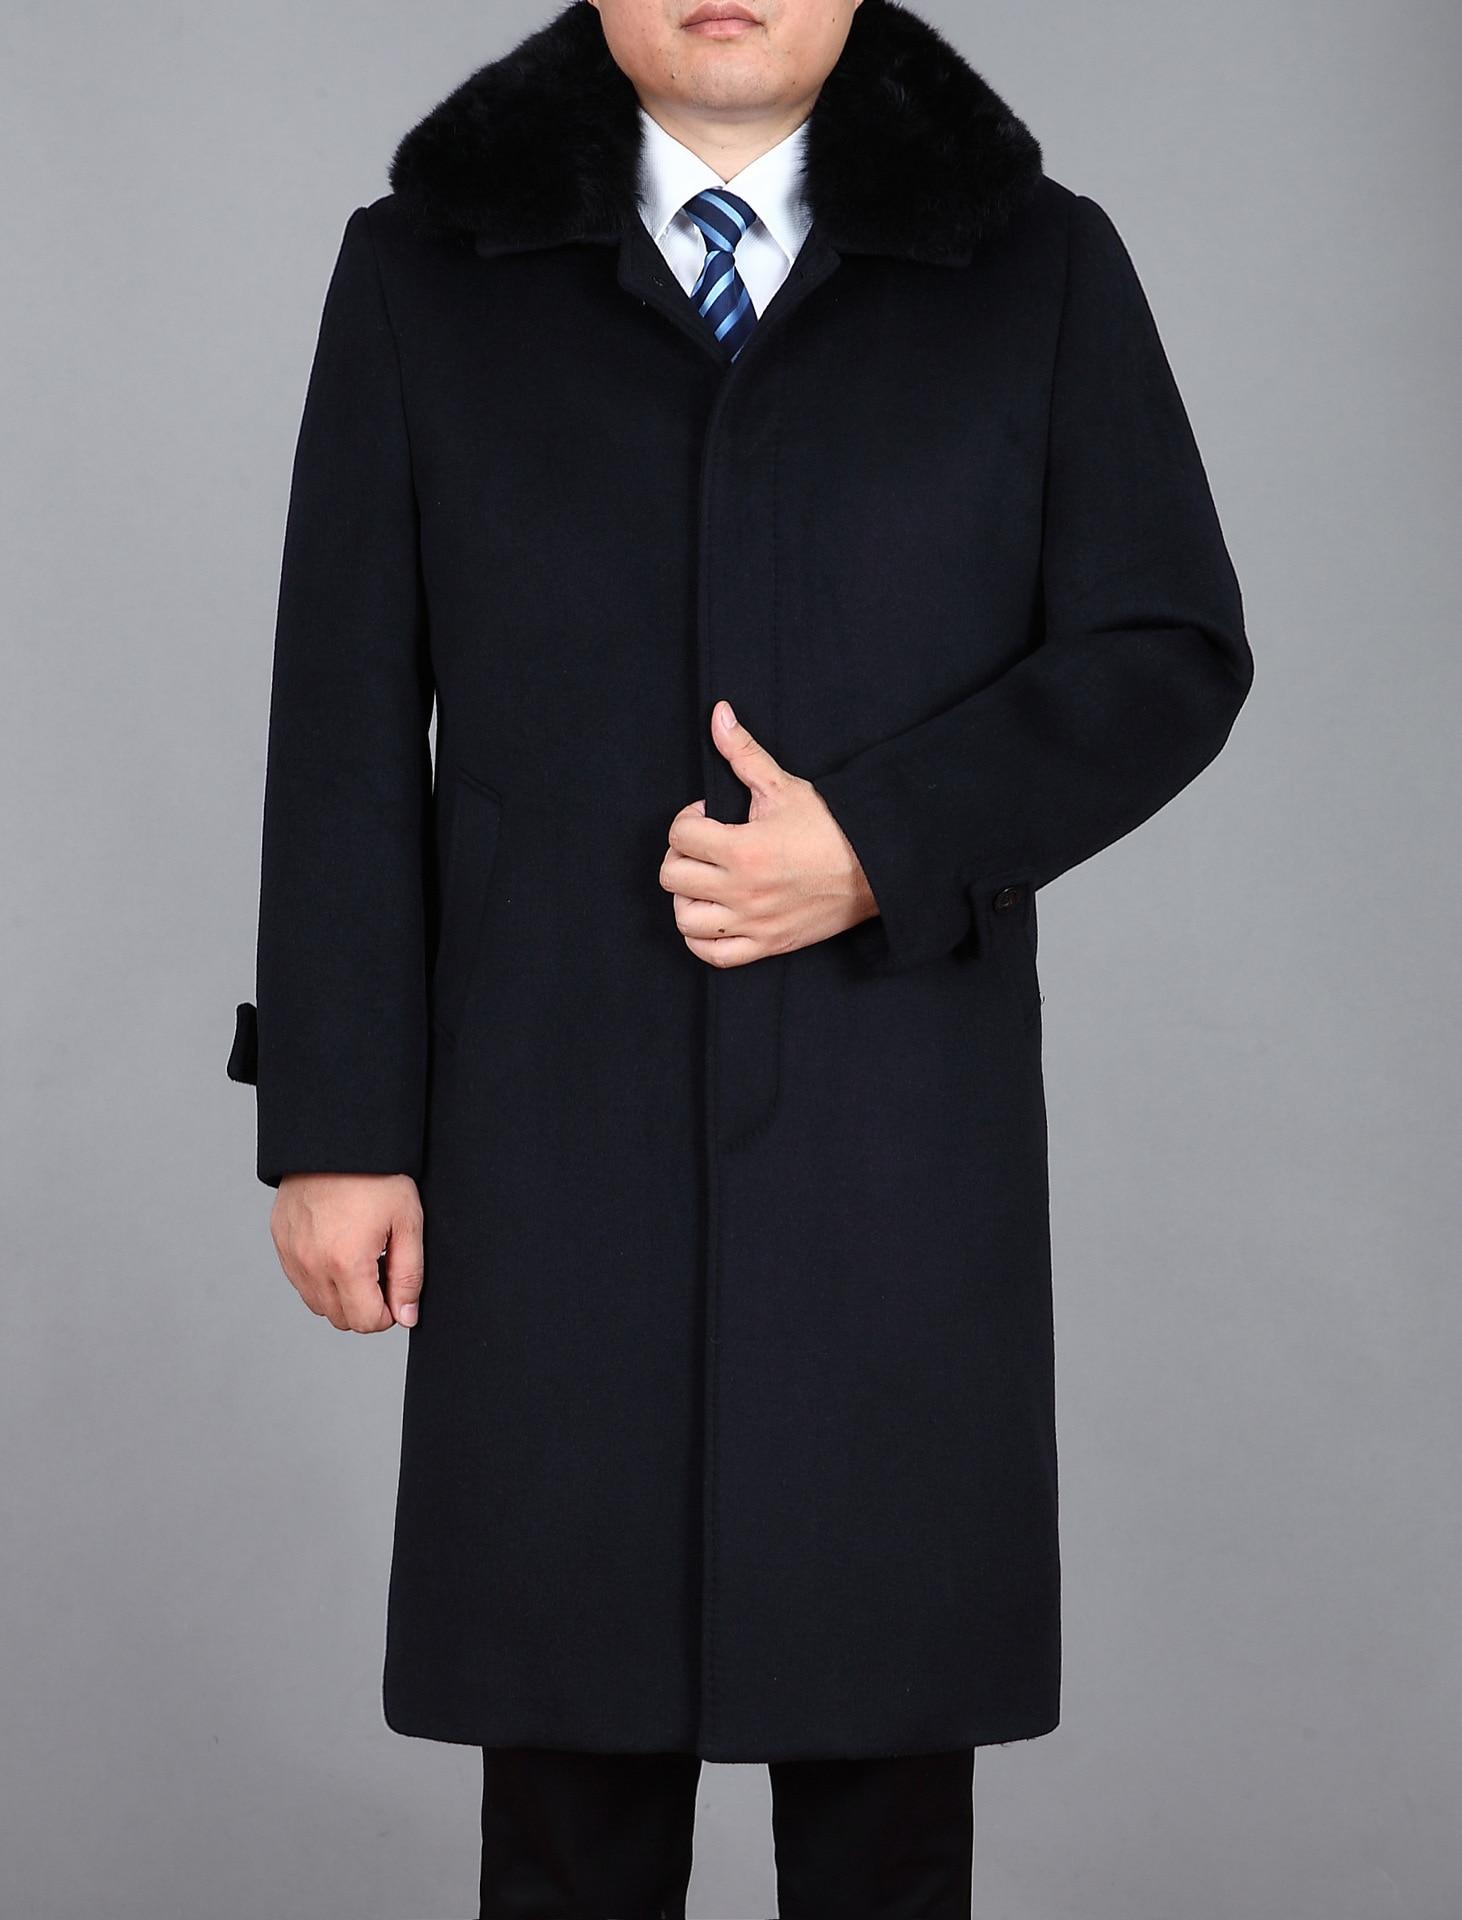 Mens Wool Coats And Jackets Men's Cashmere Coat Long Suit Jacket ...